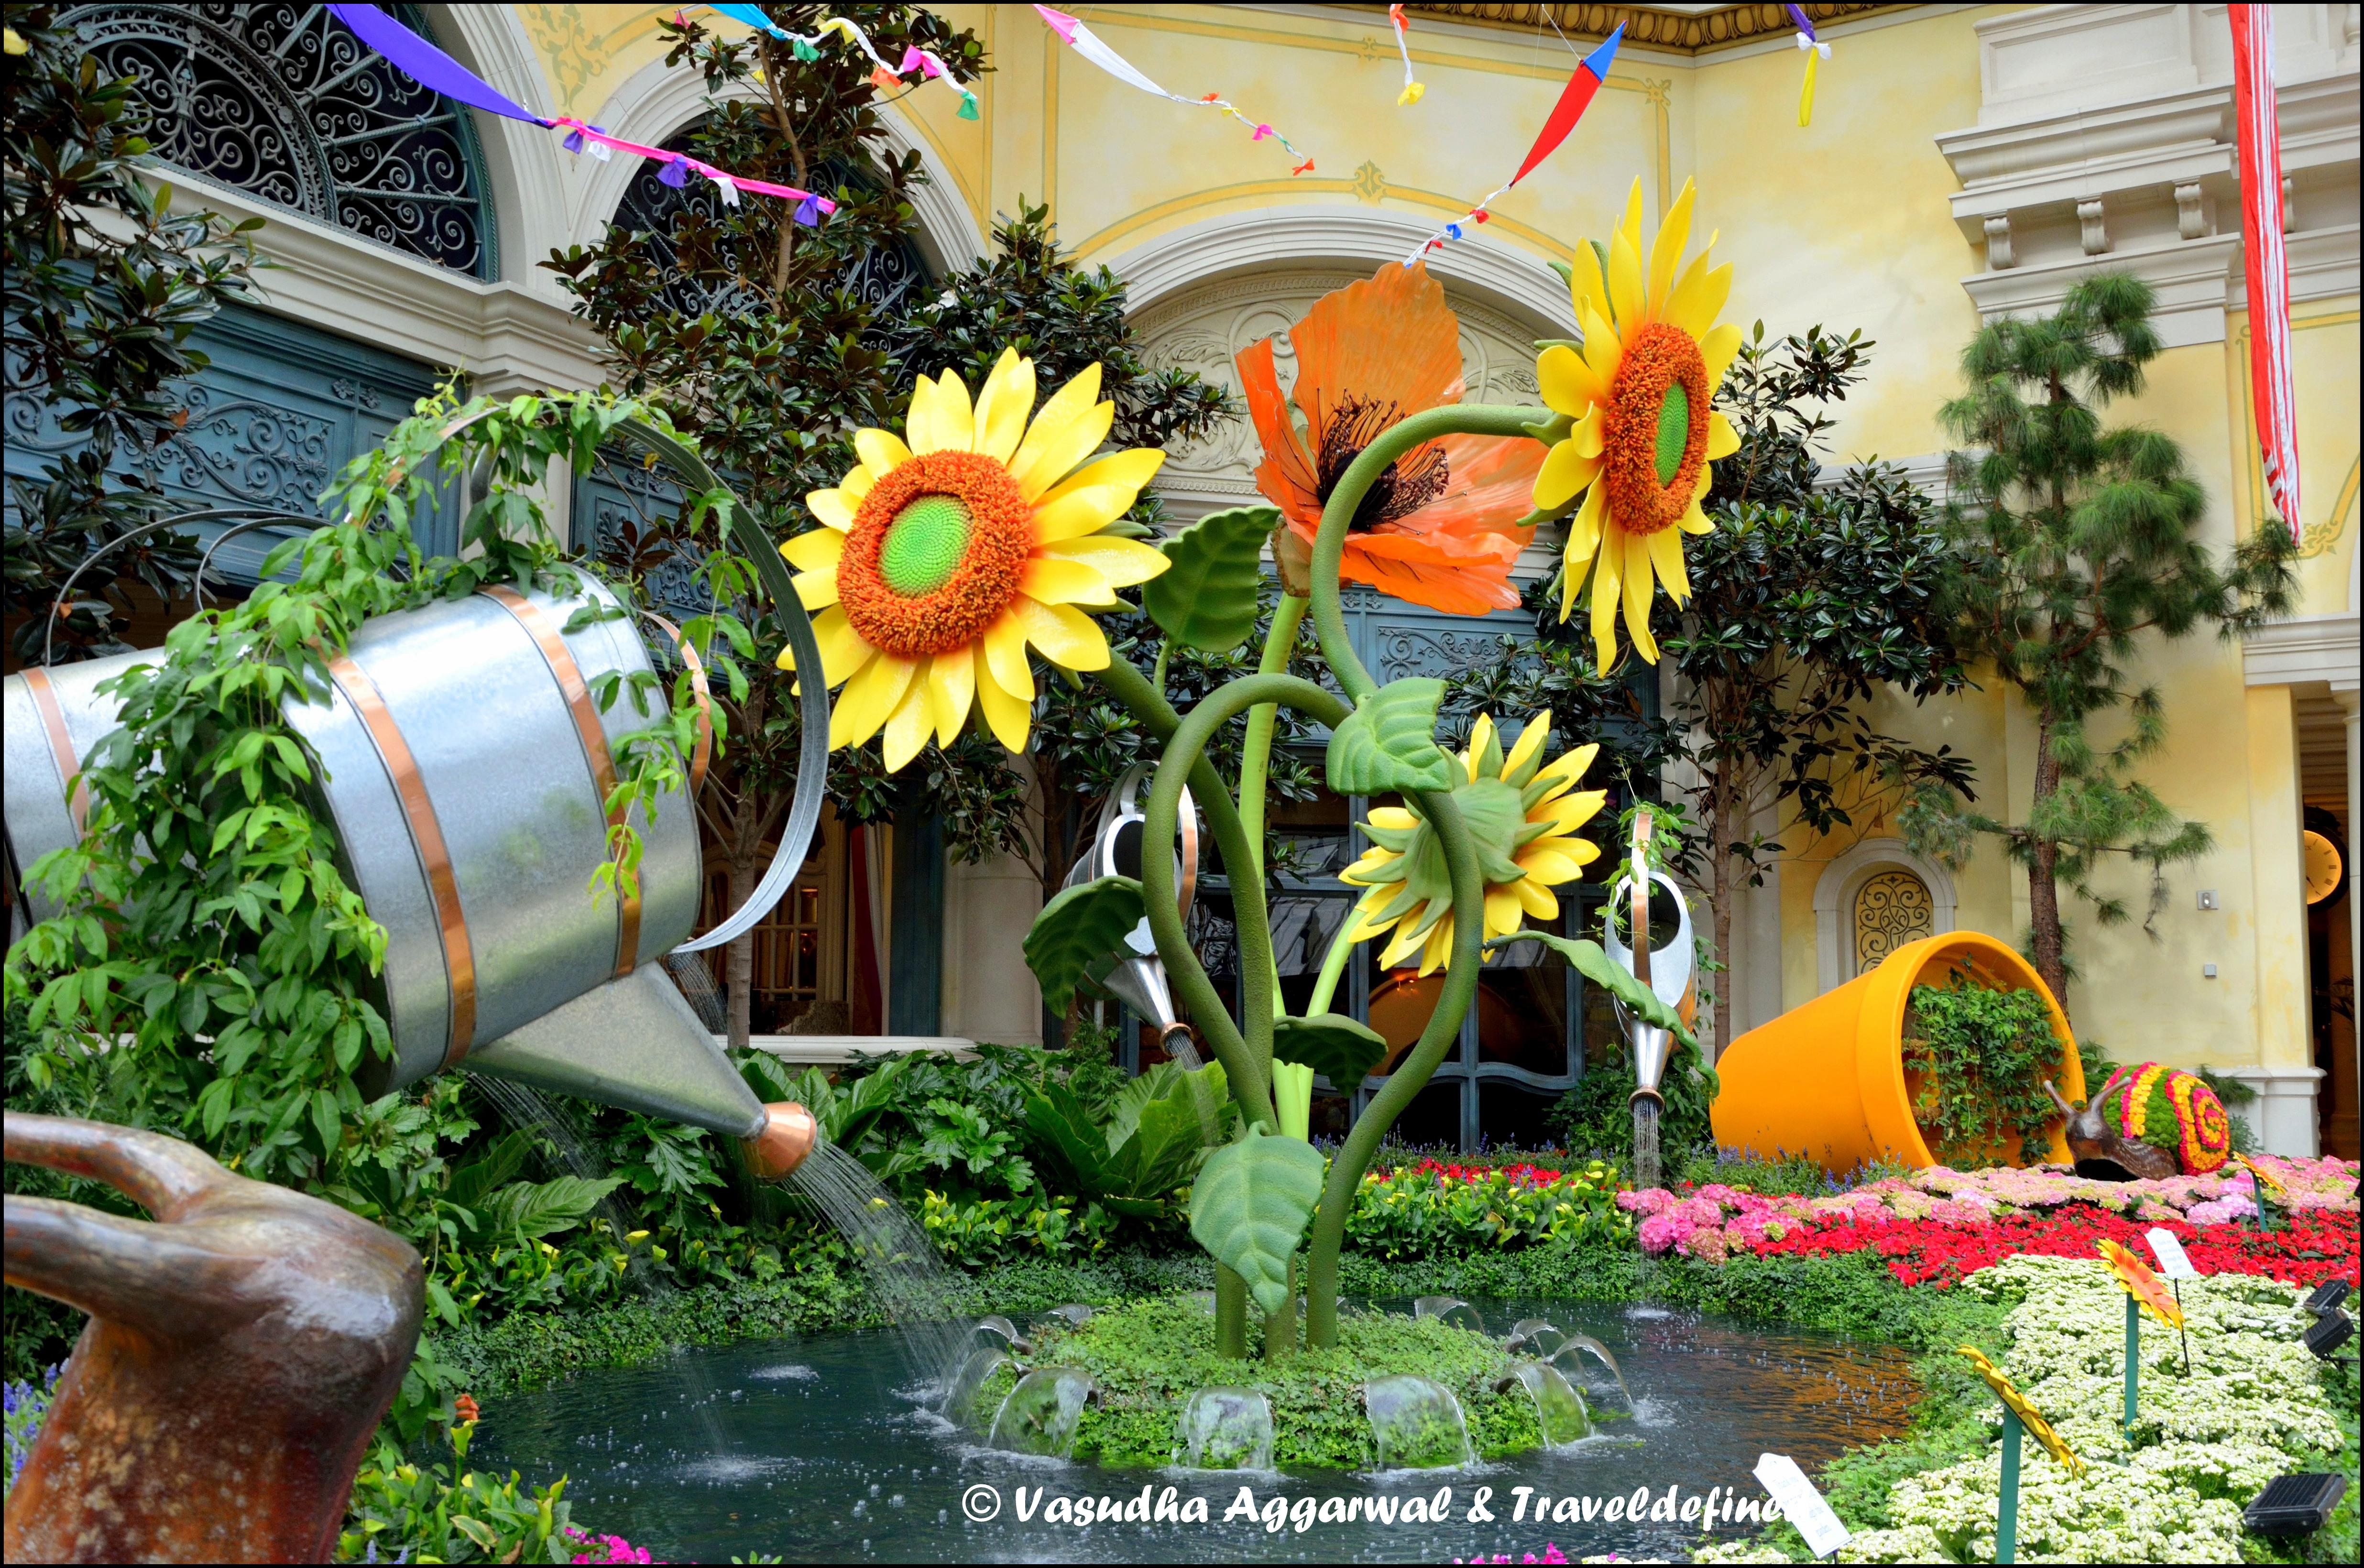 Las Vegas Bellagio Botanical Gardens Traveldefined